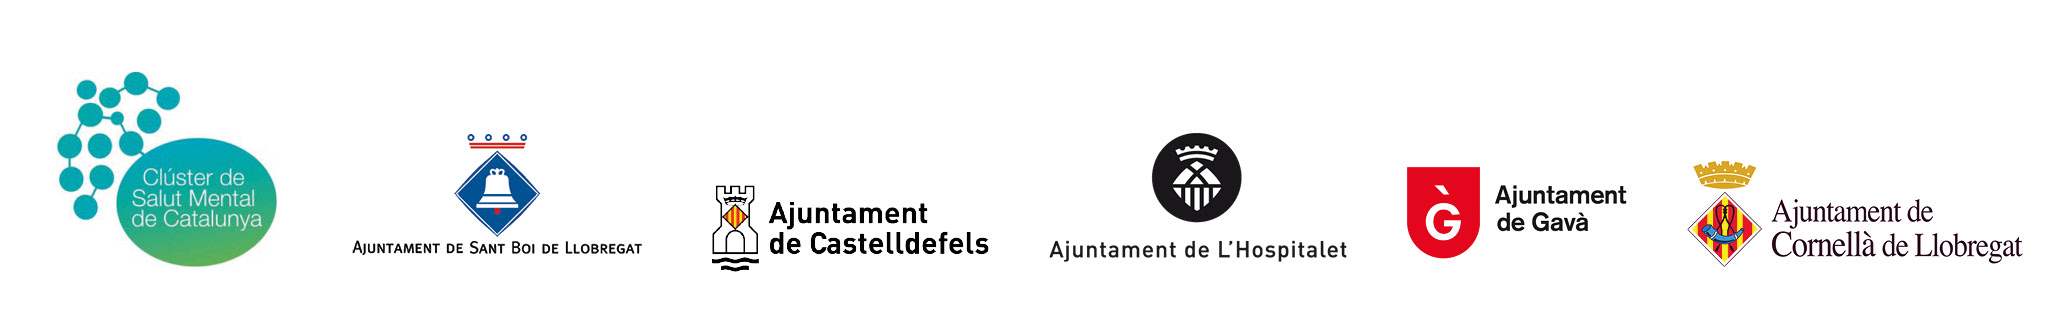 F. O. INSTITUCIONS COLLABORADORES logos